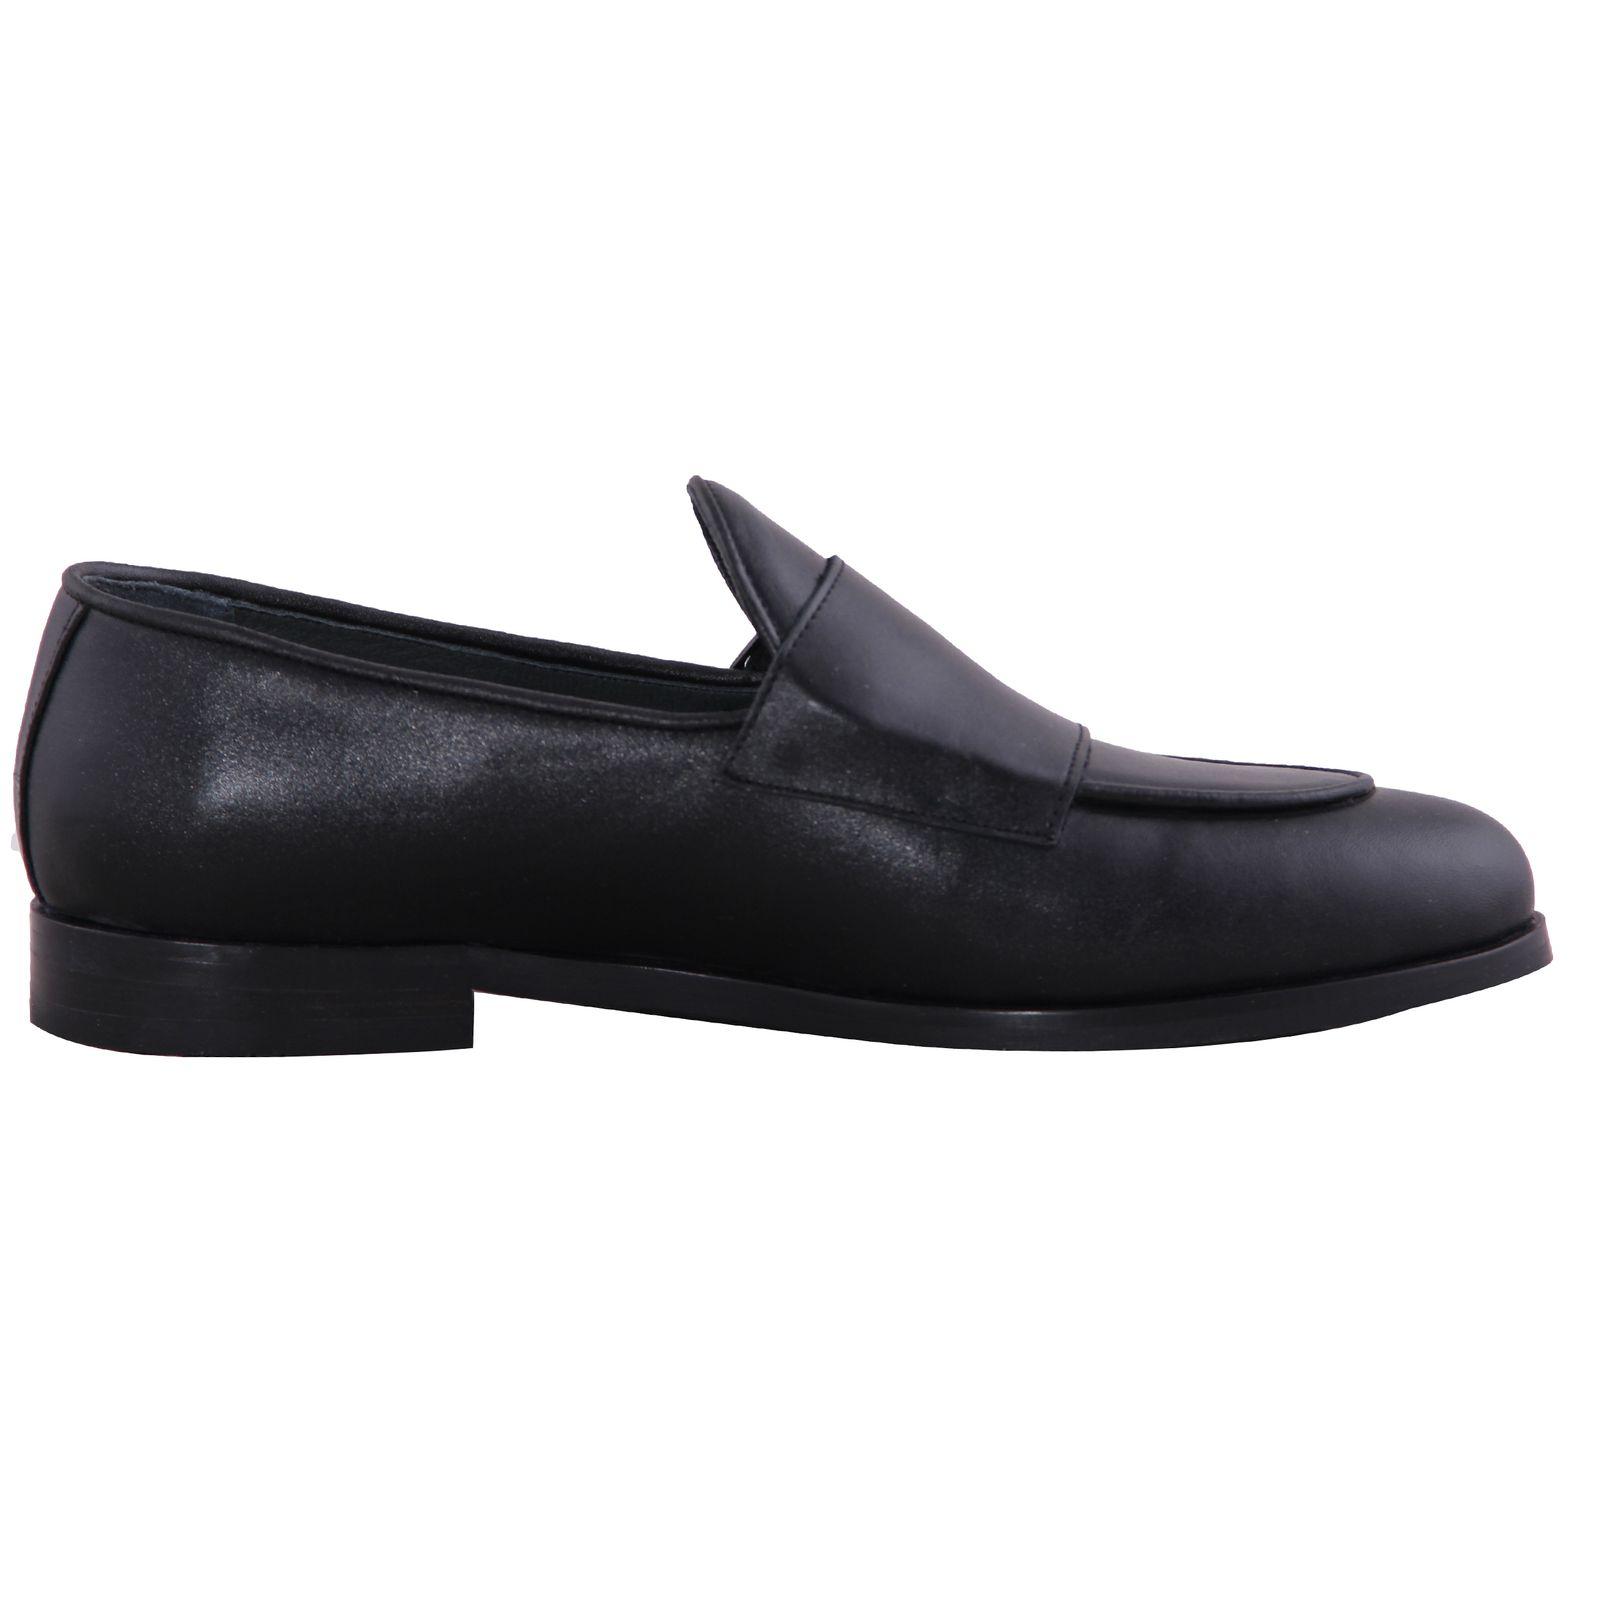 کفش مردانه شهر چرم مدل S961-1 -  - 3